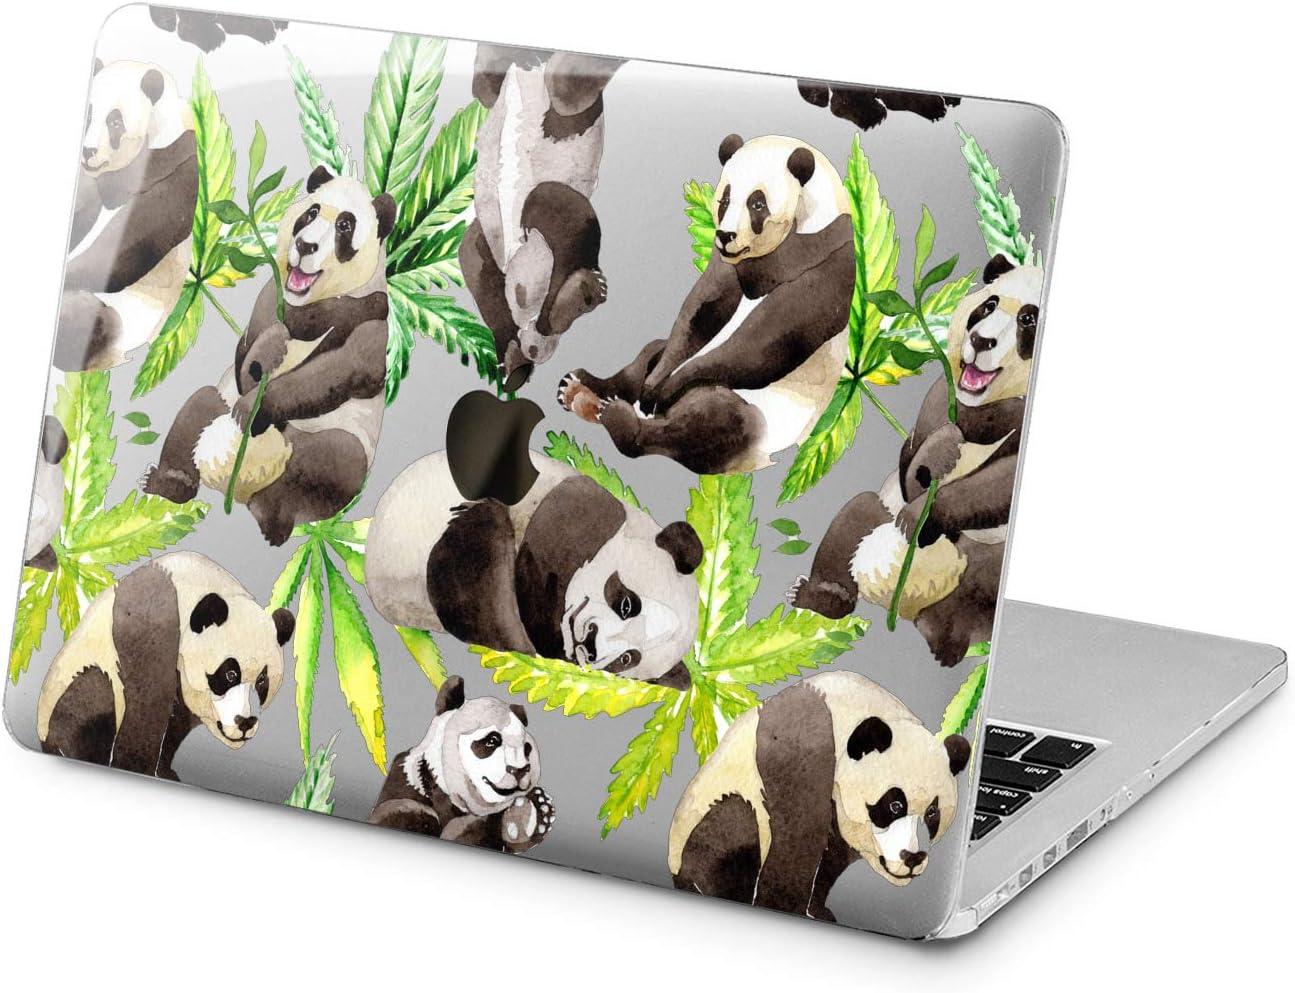 "Cavka Hard Shell Case for Apple MacBook Pro 13"" 2019 15"" 2018 Air 13"" 2020 Retina 2015 Mac 11"" Mac 12"" Protective Laptop Panda New Cover Plastic Leaves Green Bear Zoo Animal Design Print Bamboo Cute"